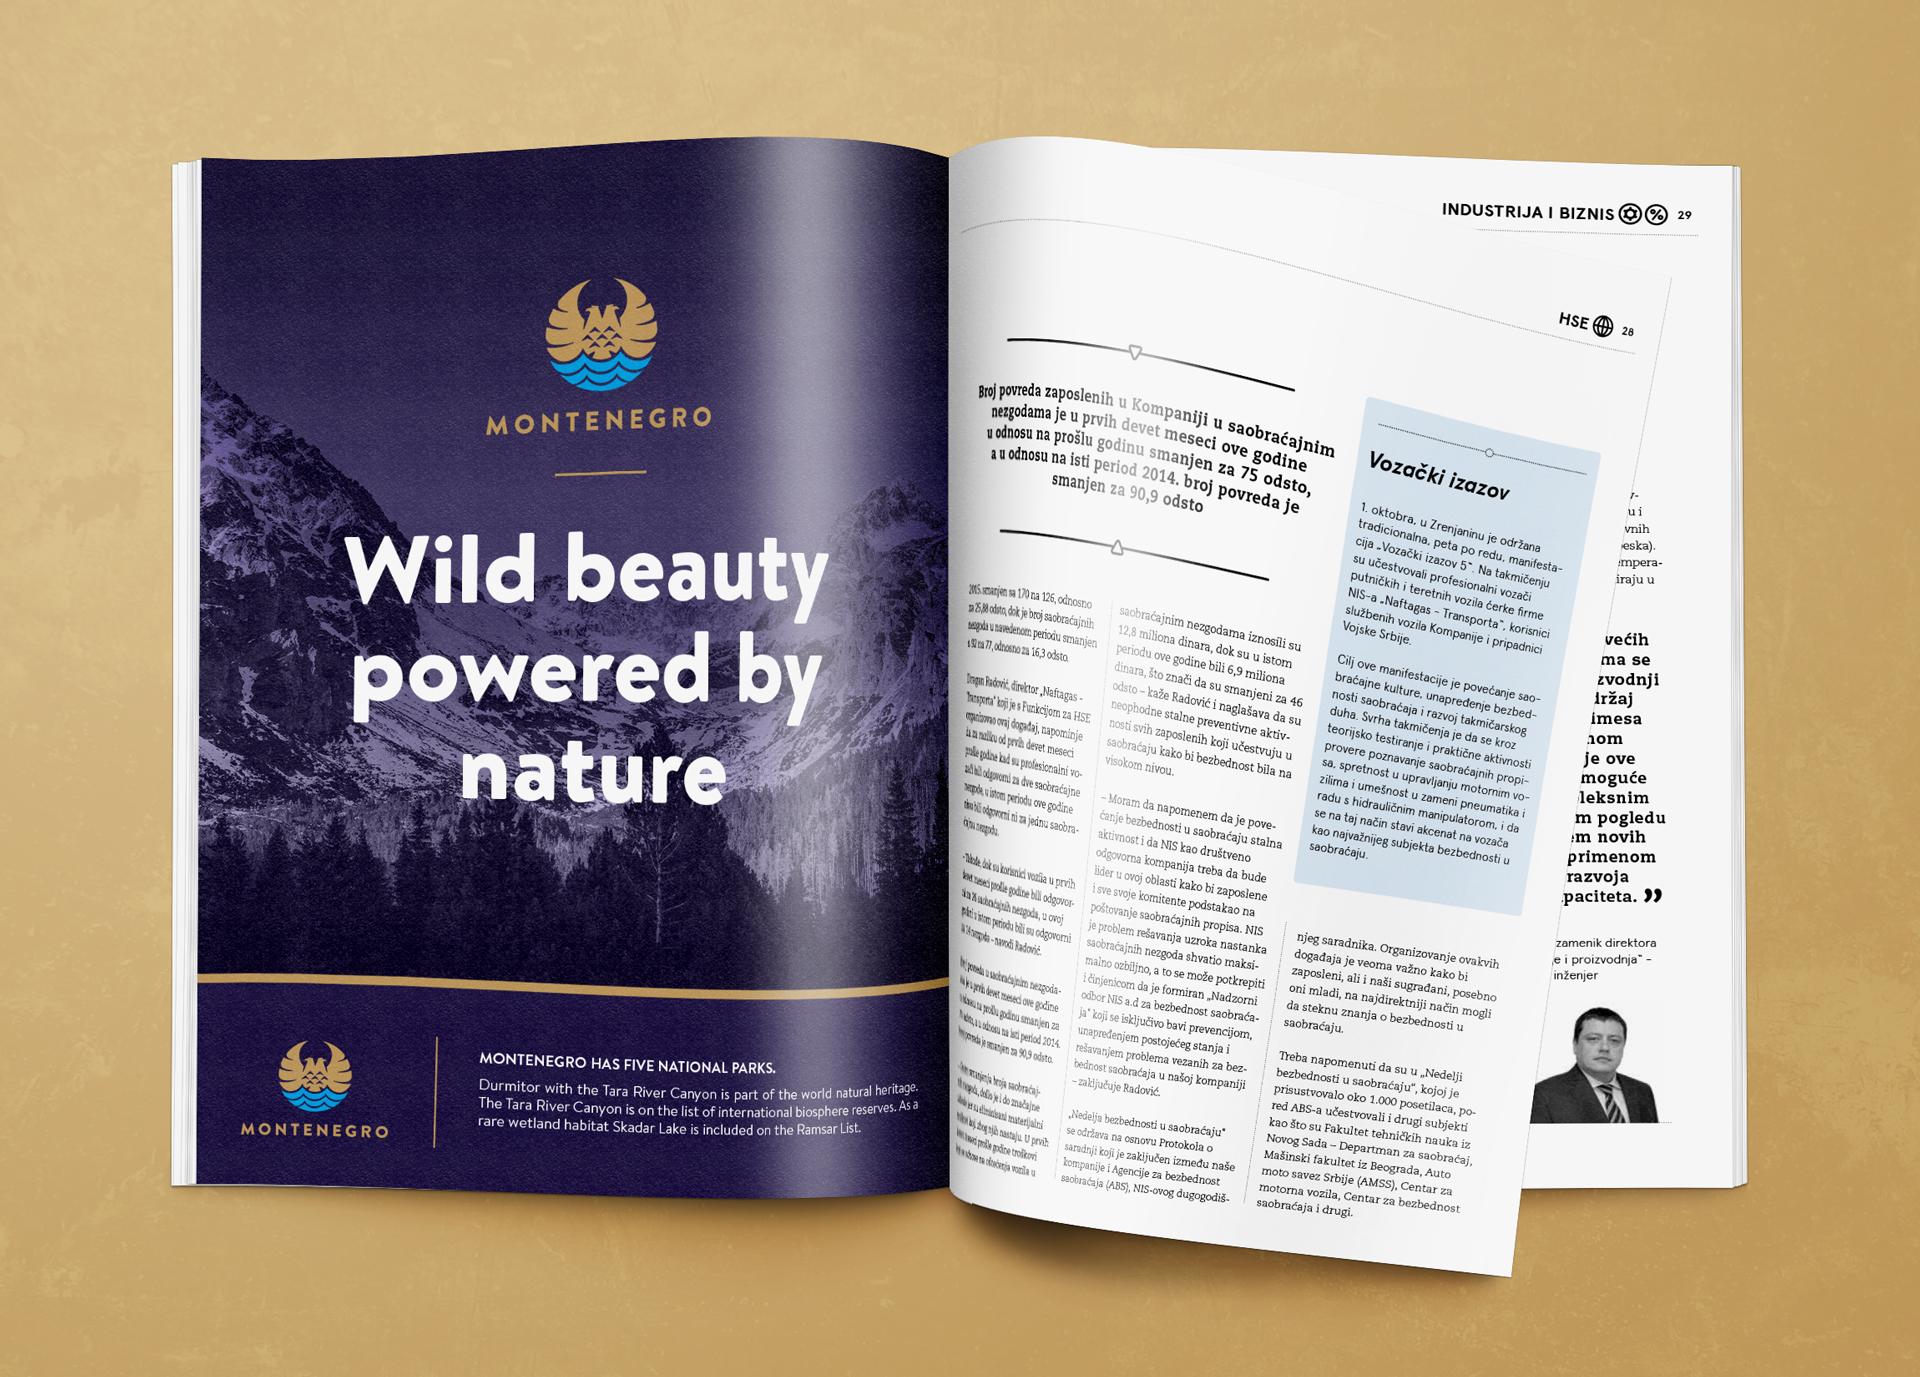 Dizajn novinskog oglasa nacionalnog brenda Crne Gore Montenegro